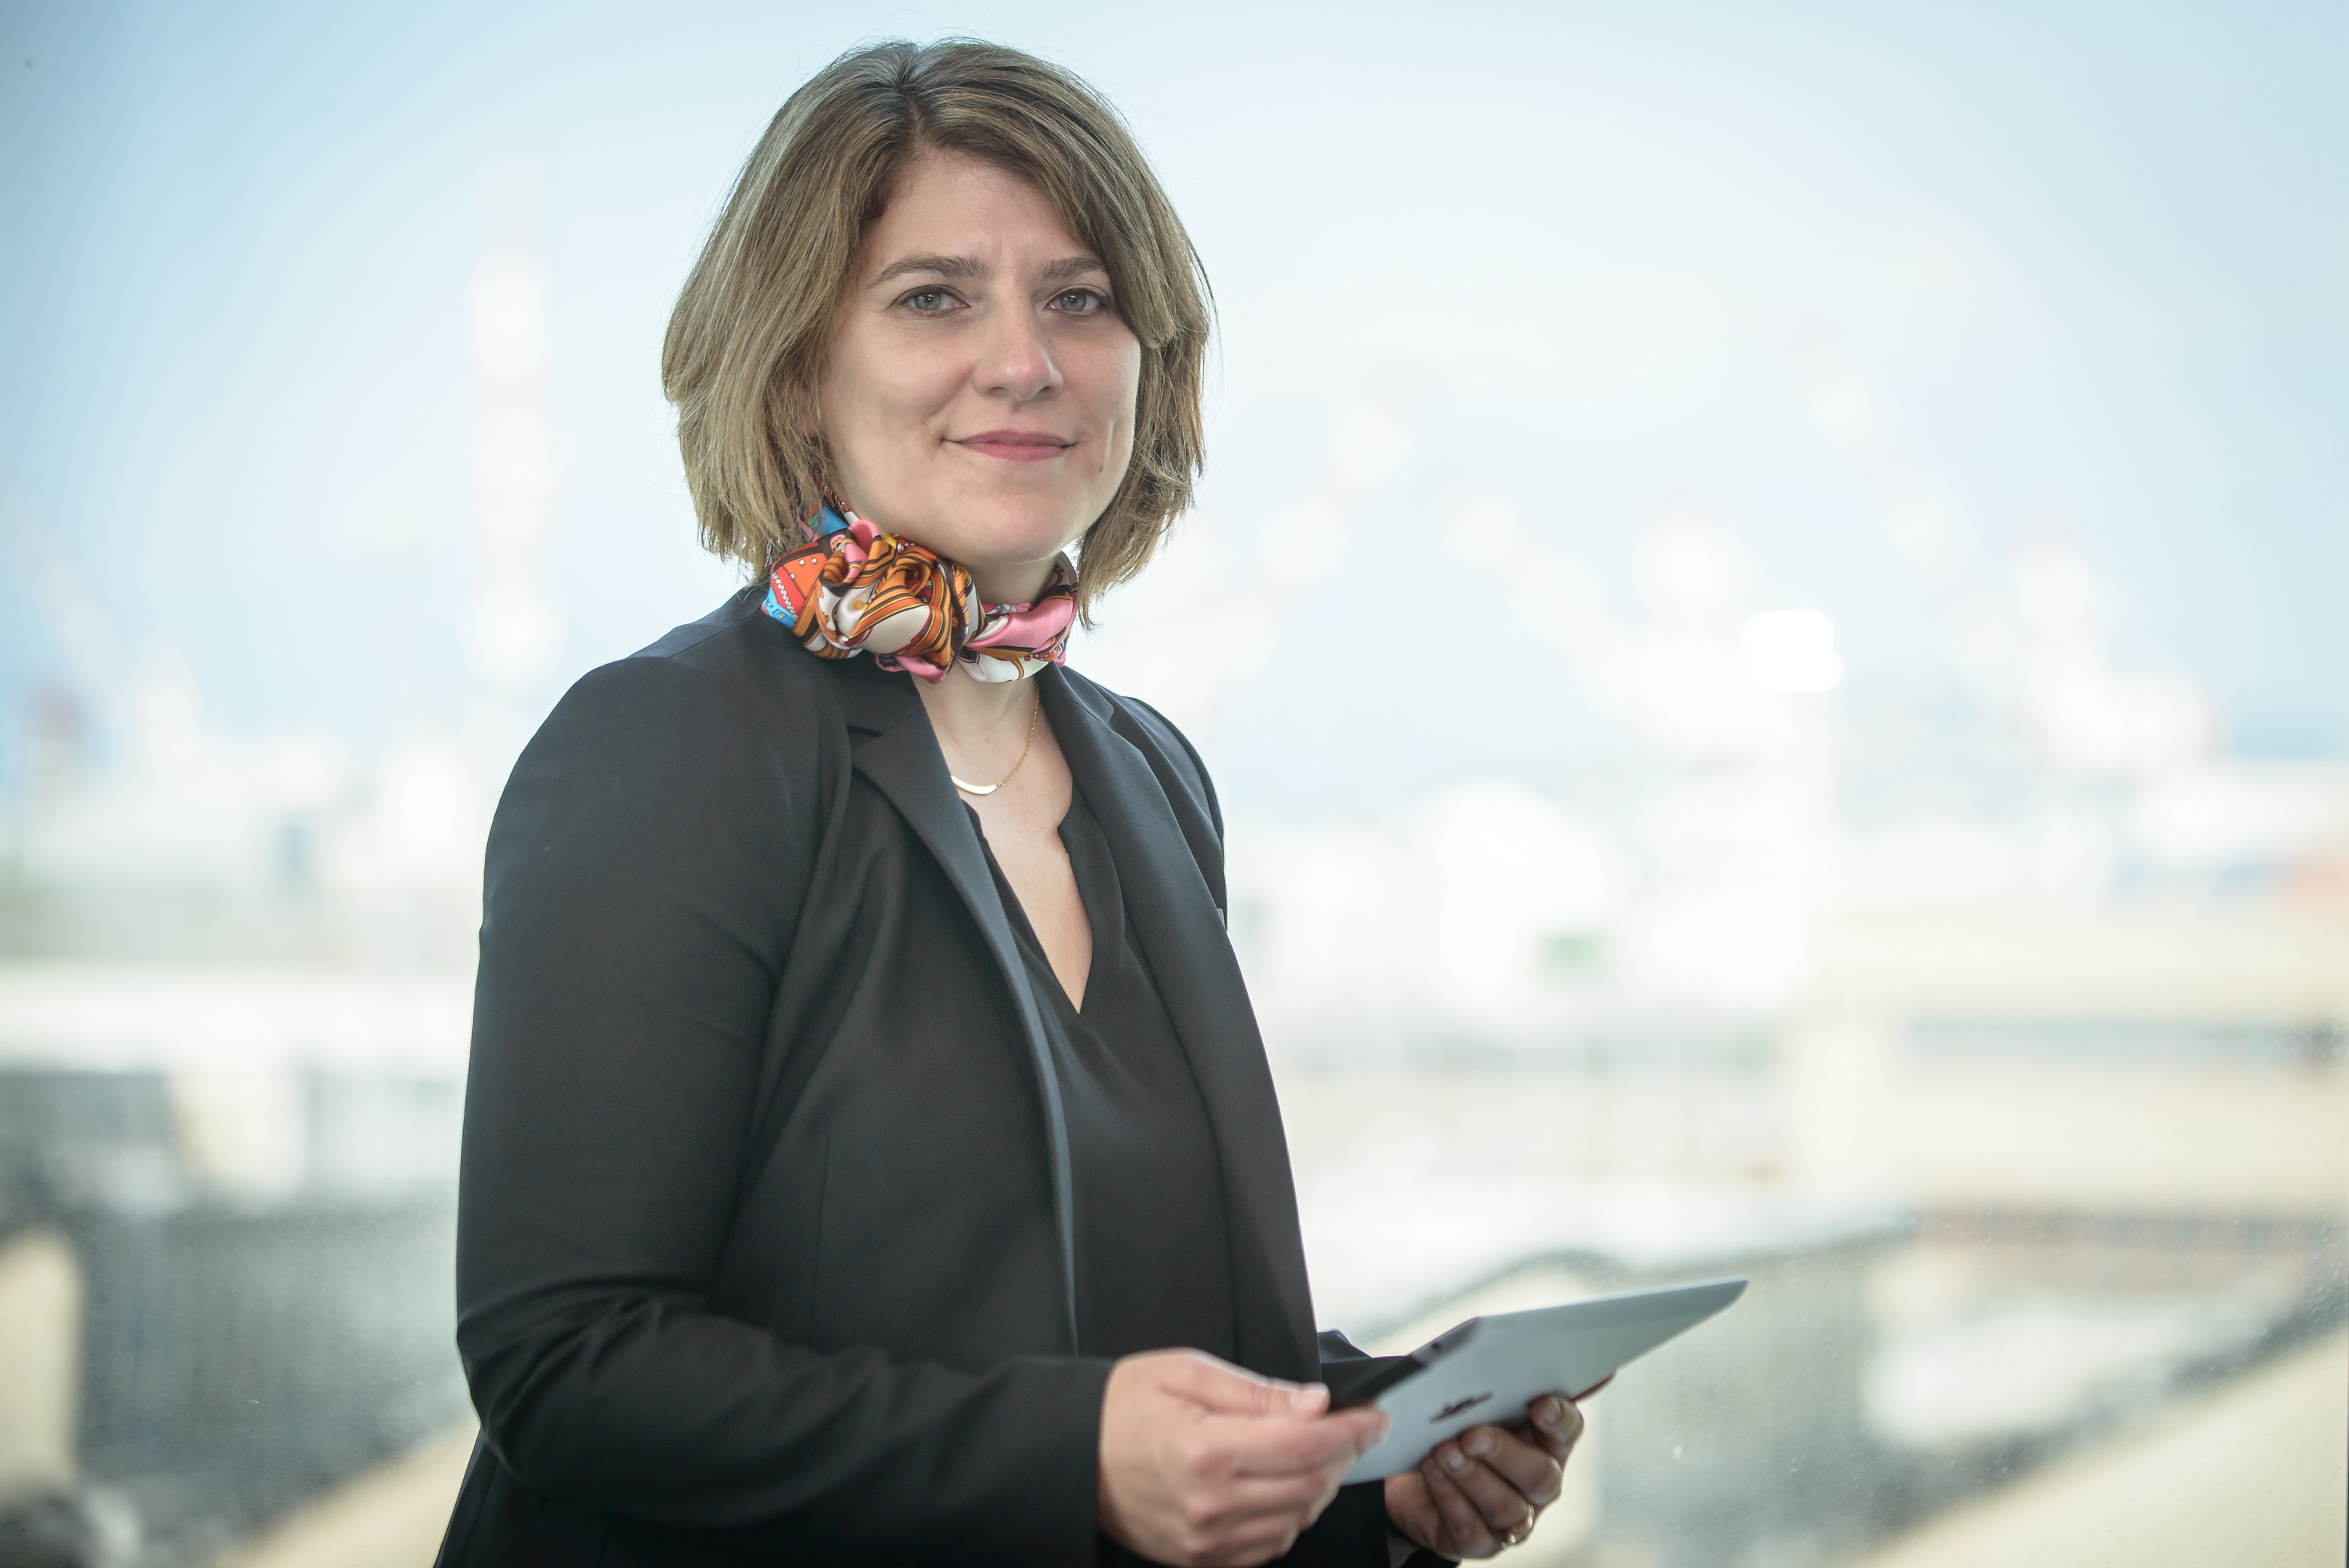 Susan Peterson-Sturm, Digital Lead, BU Power Generation and Water.